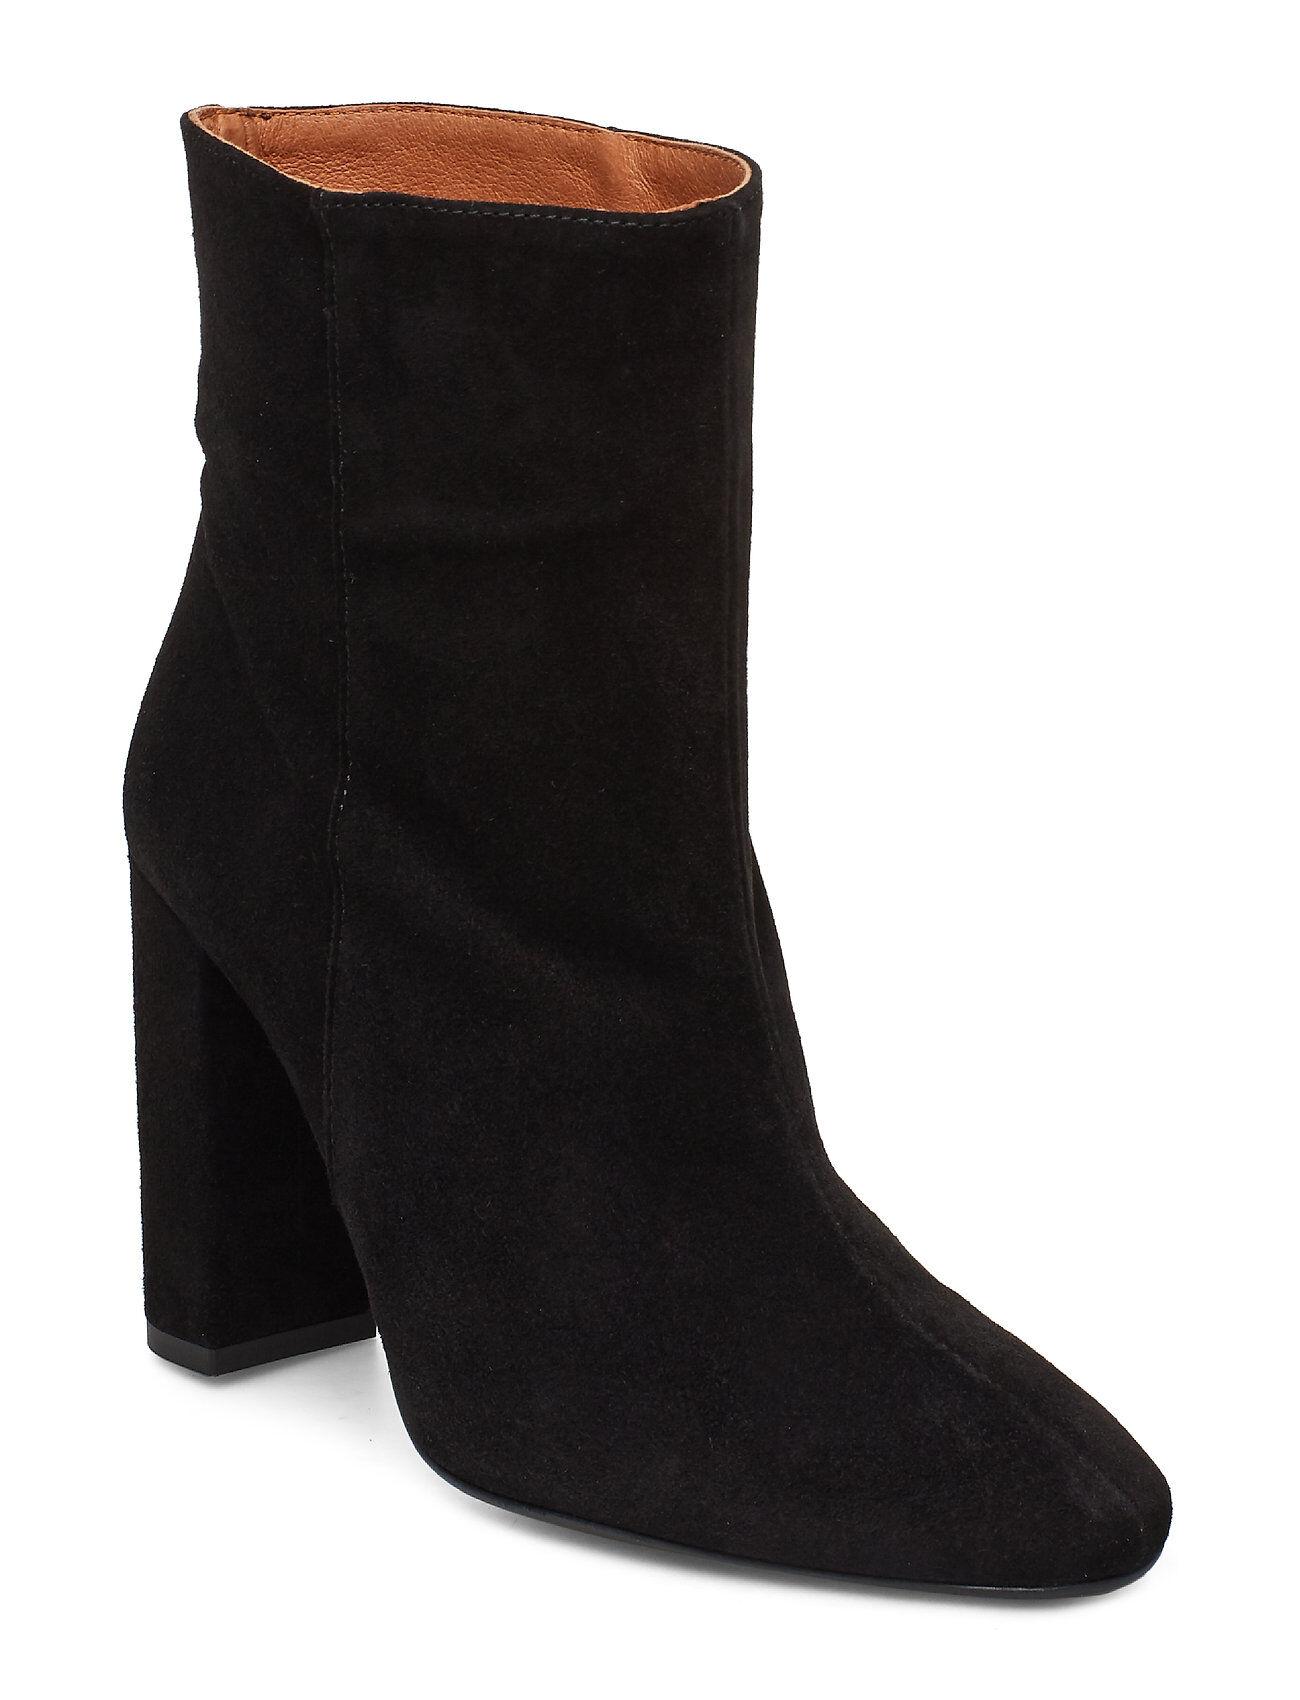 Henry Kole Joan Suede Black Shoes Boots Ankle Boots Ankle Boots With Heel Musta Henry Kole